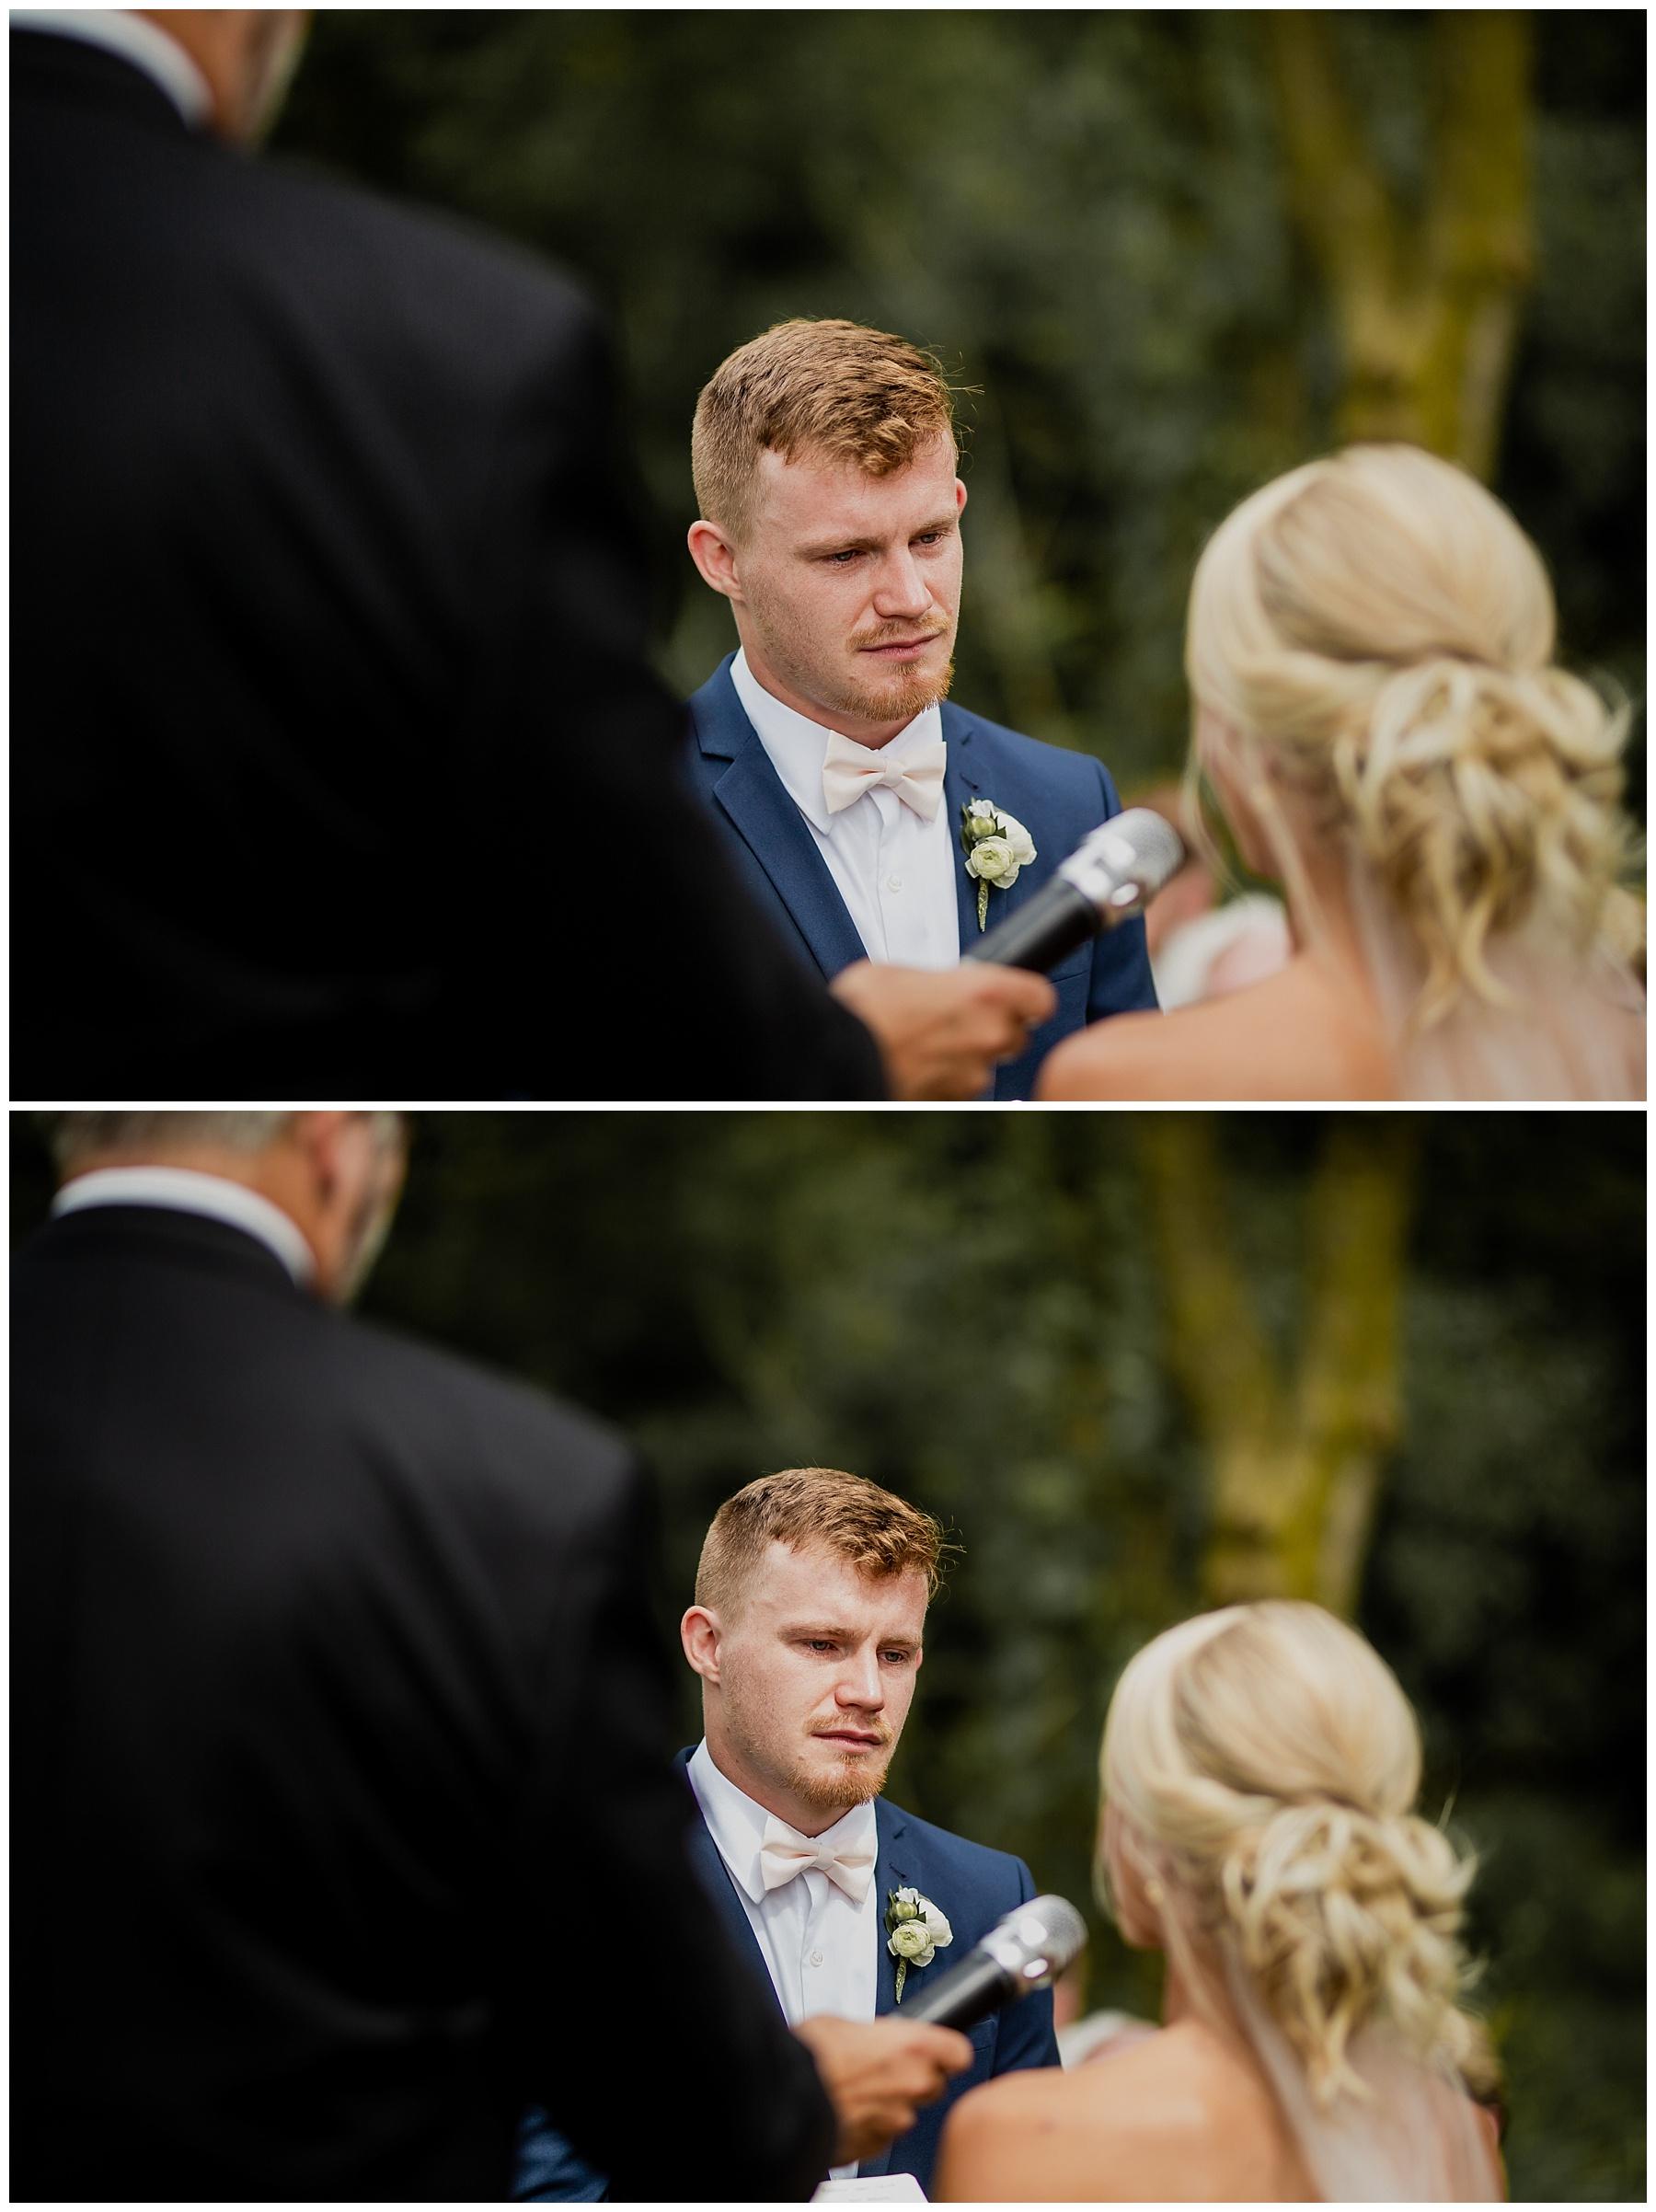 WISCONSIN WEDDING PHOTOGRAPHER 105.jpg